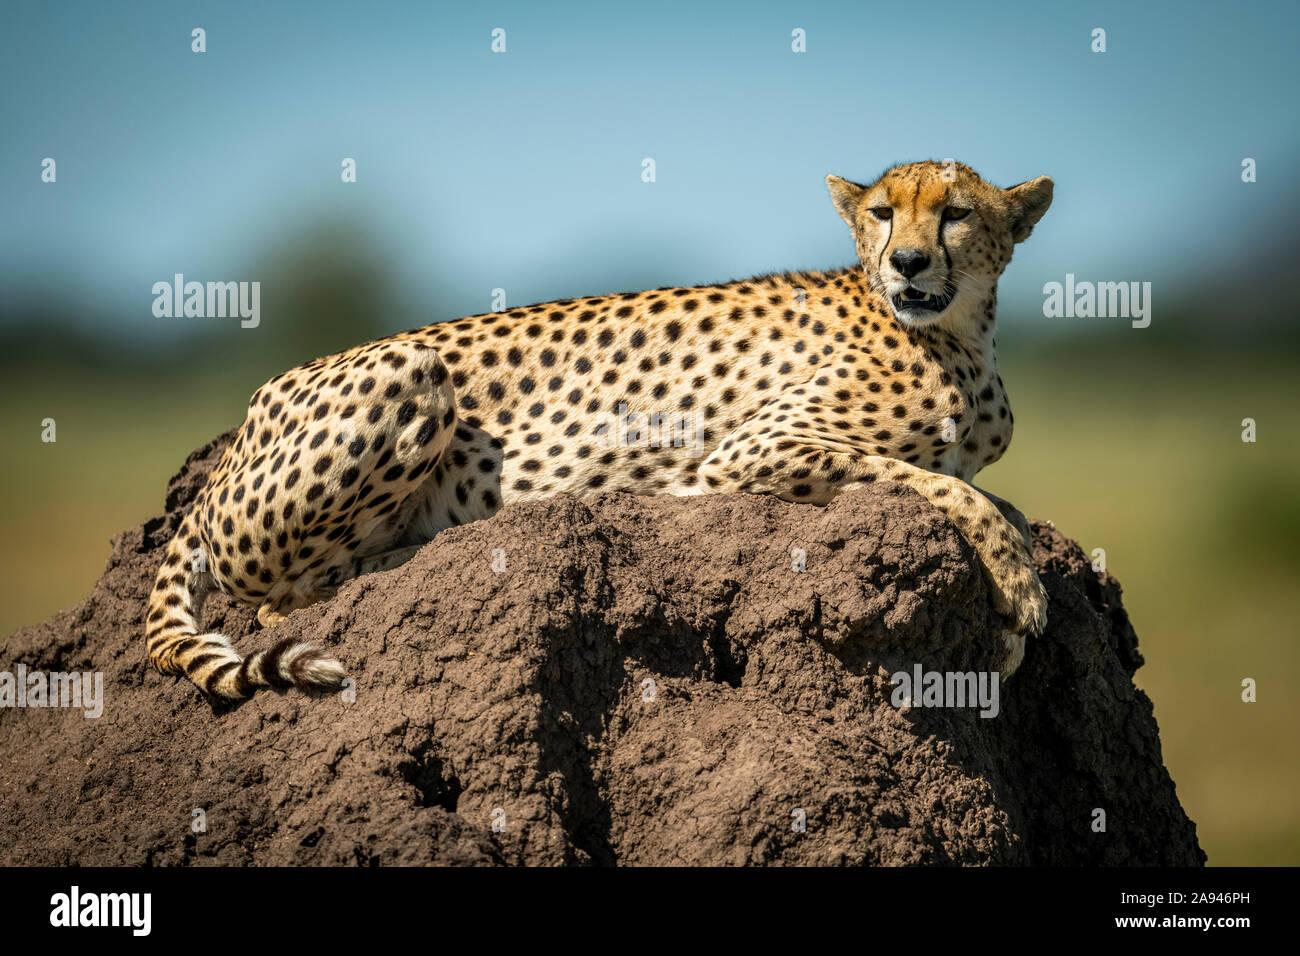 Cheetah (Acinonyx jubatus)  lies on mound with blurred background, Grumeti Serengeti Tented Camp, Serengeti National Park; Tanzania Stock Photo